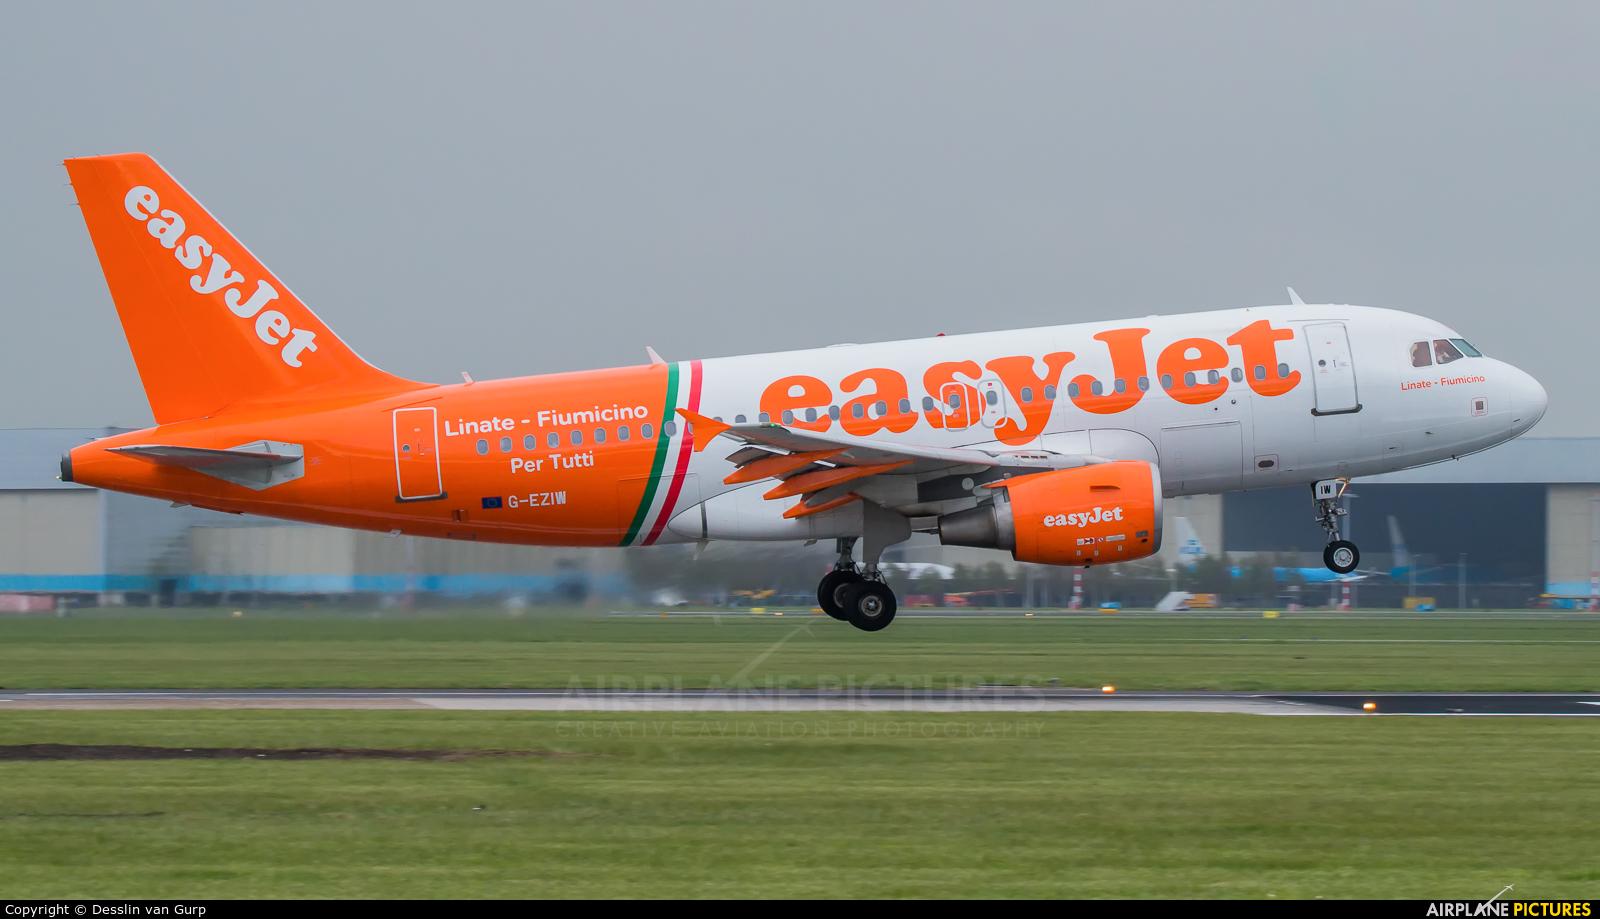 easyJet G-EZIW aircraft at Amsterdam - Schiphol